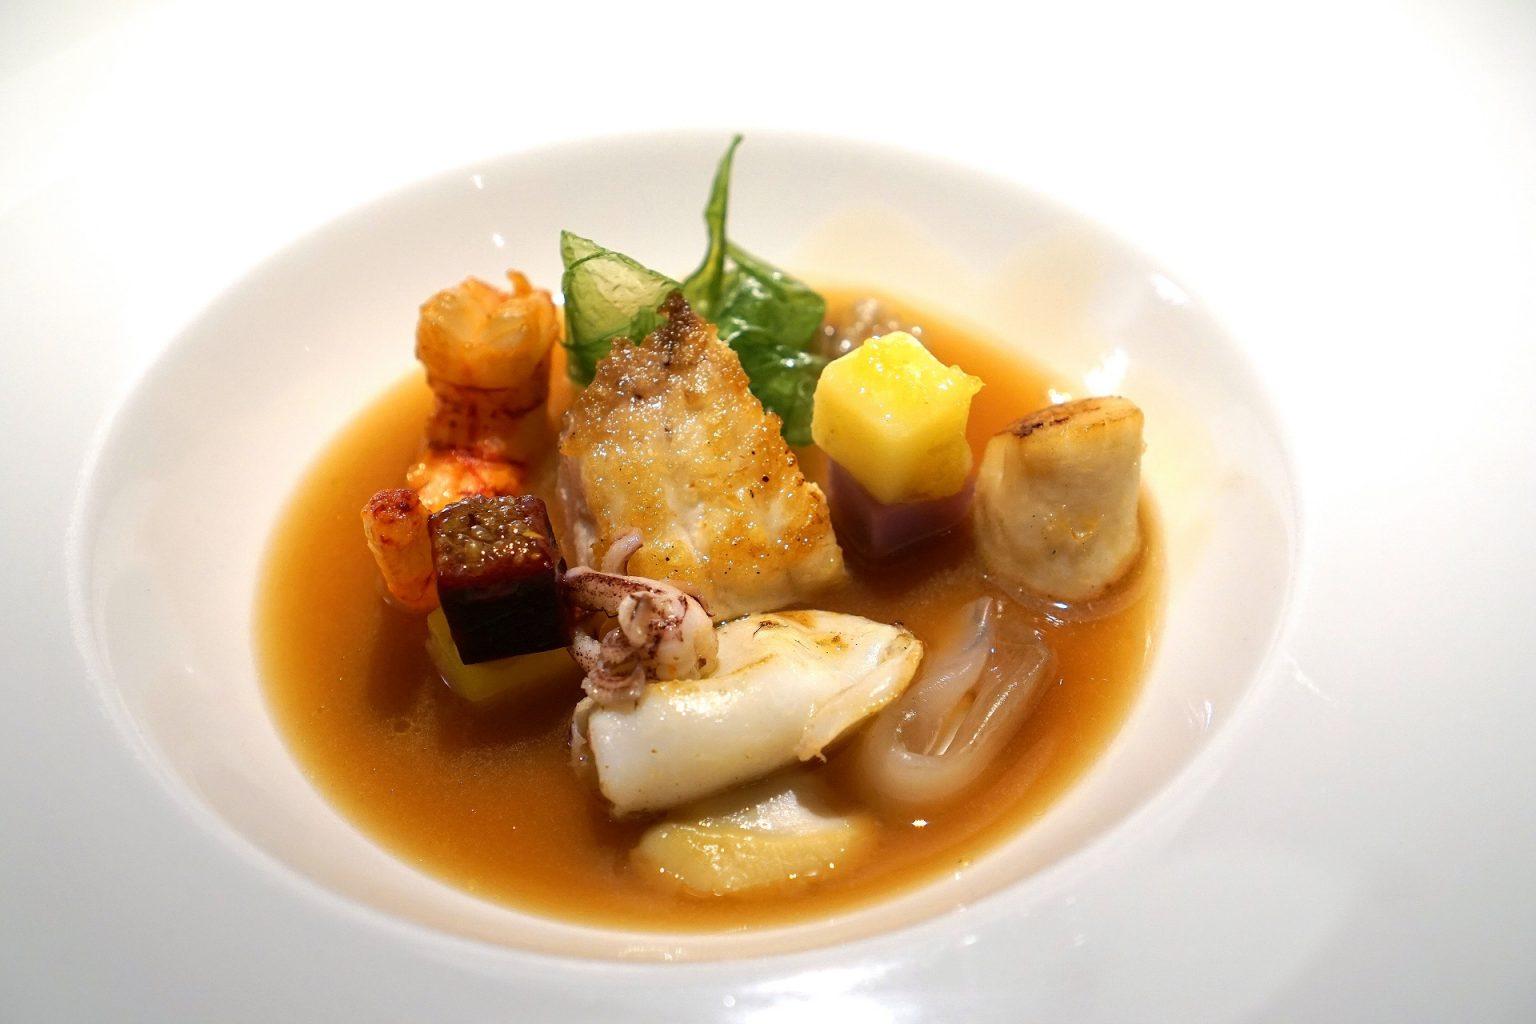 Peca, Portinari, zuppa